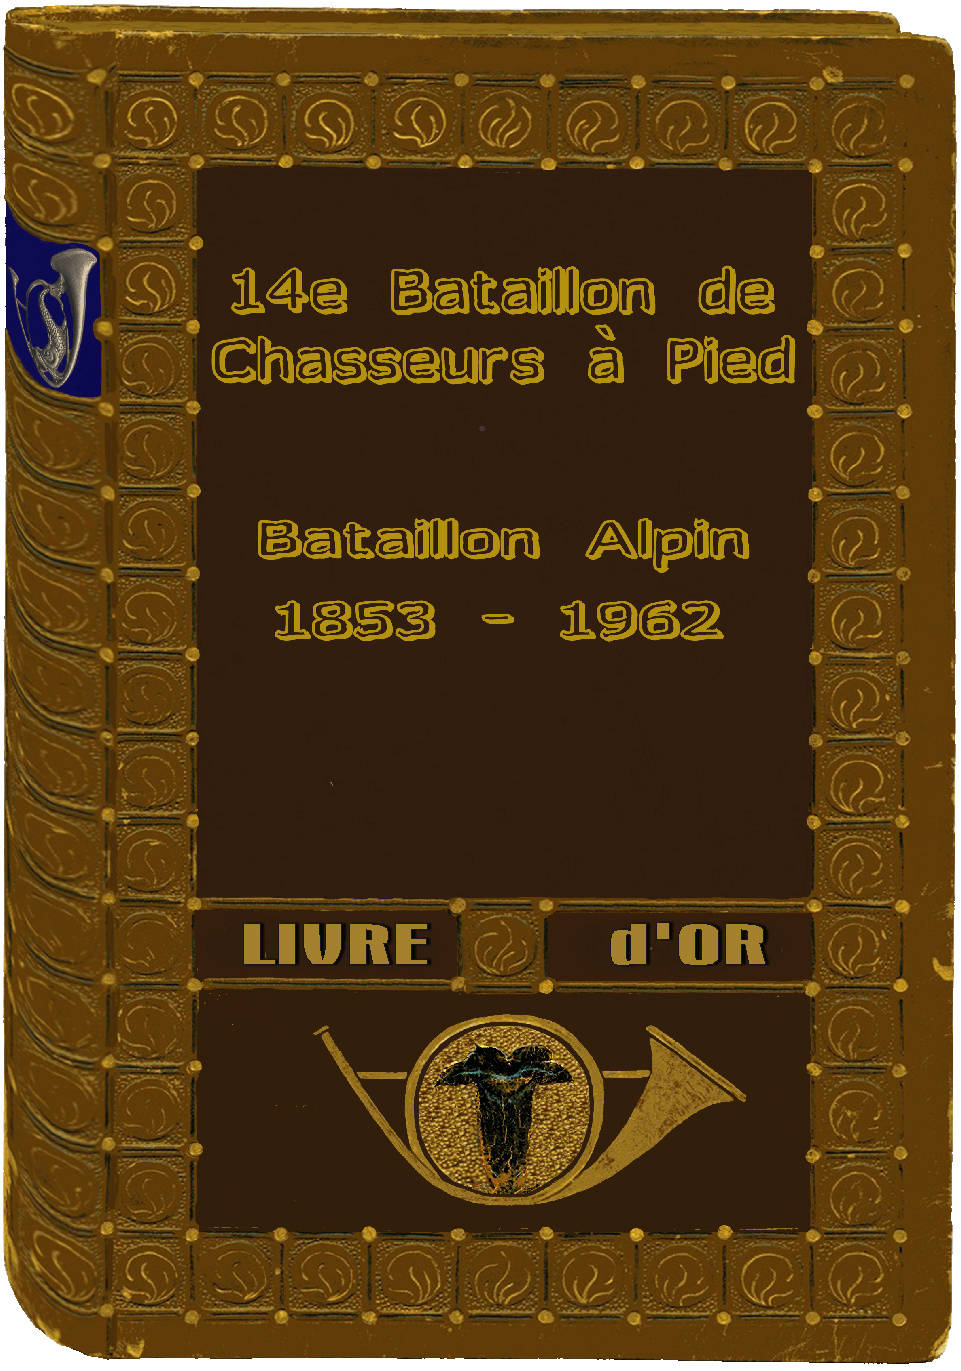 14e Bataillon de Chasseurs - Page 5 Page_110